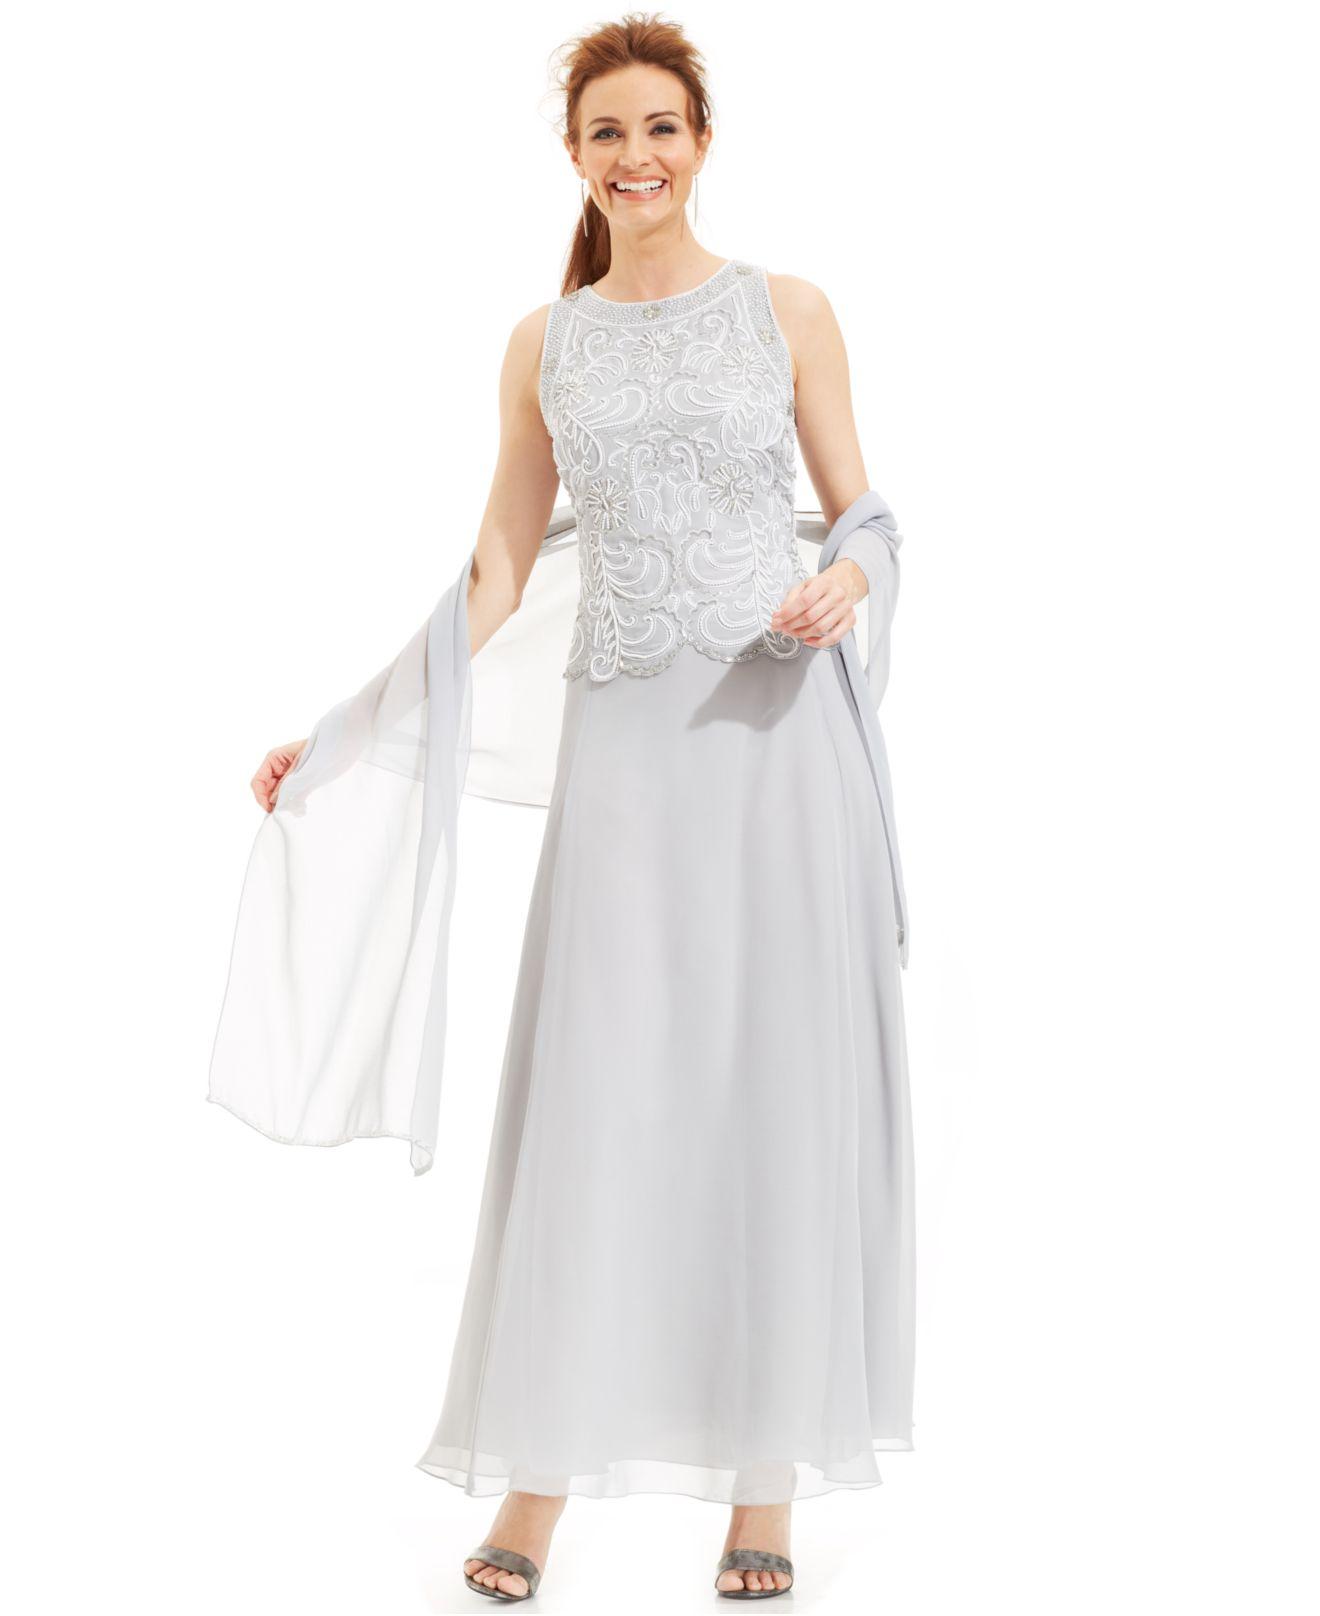 e84c5e6f71e0 J Kara Beaded Bodice Chiffon Gown And Shawl in Metallic - Lyst